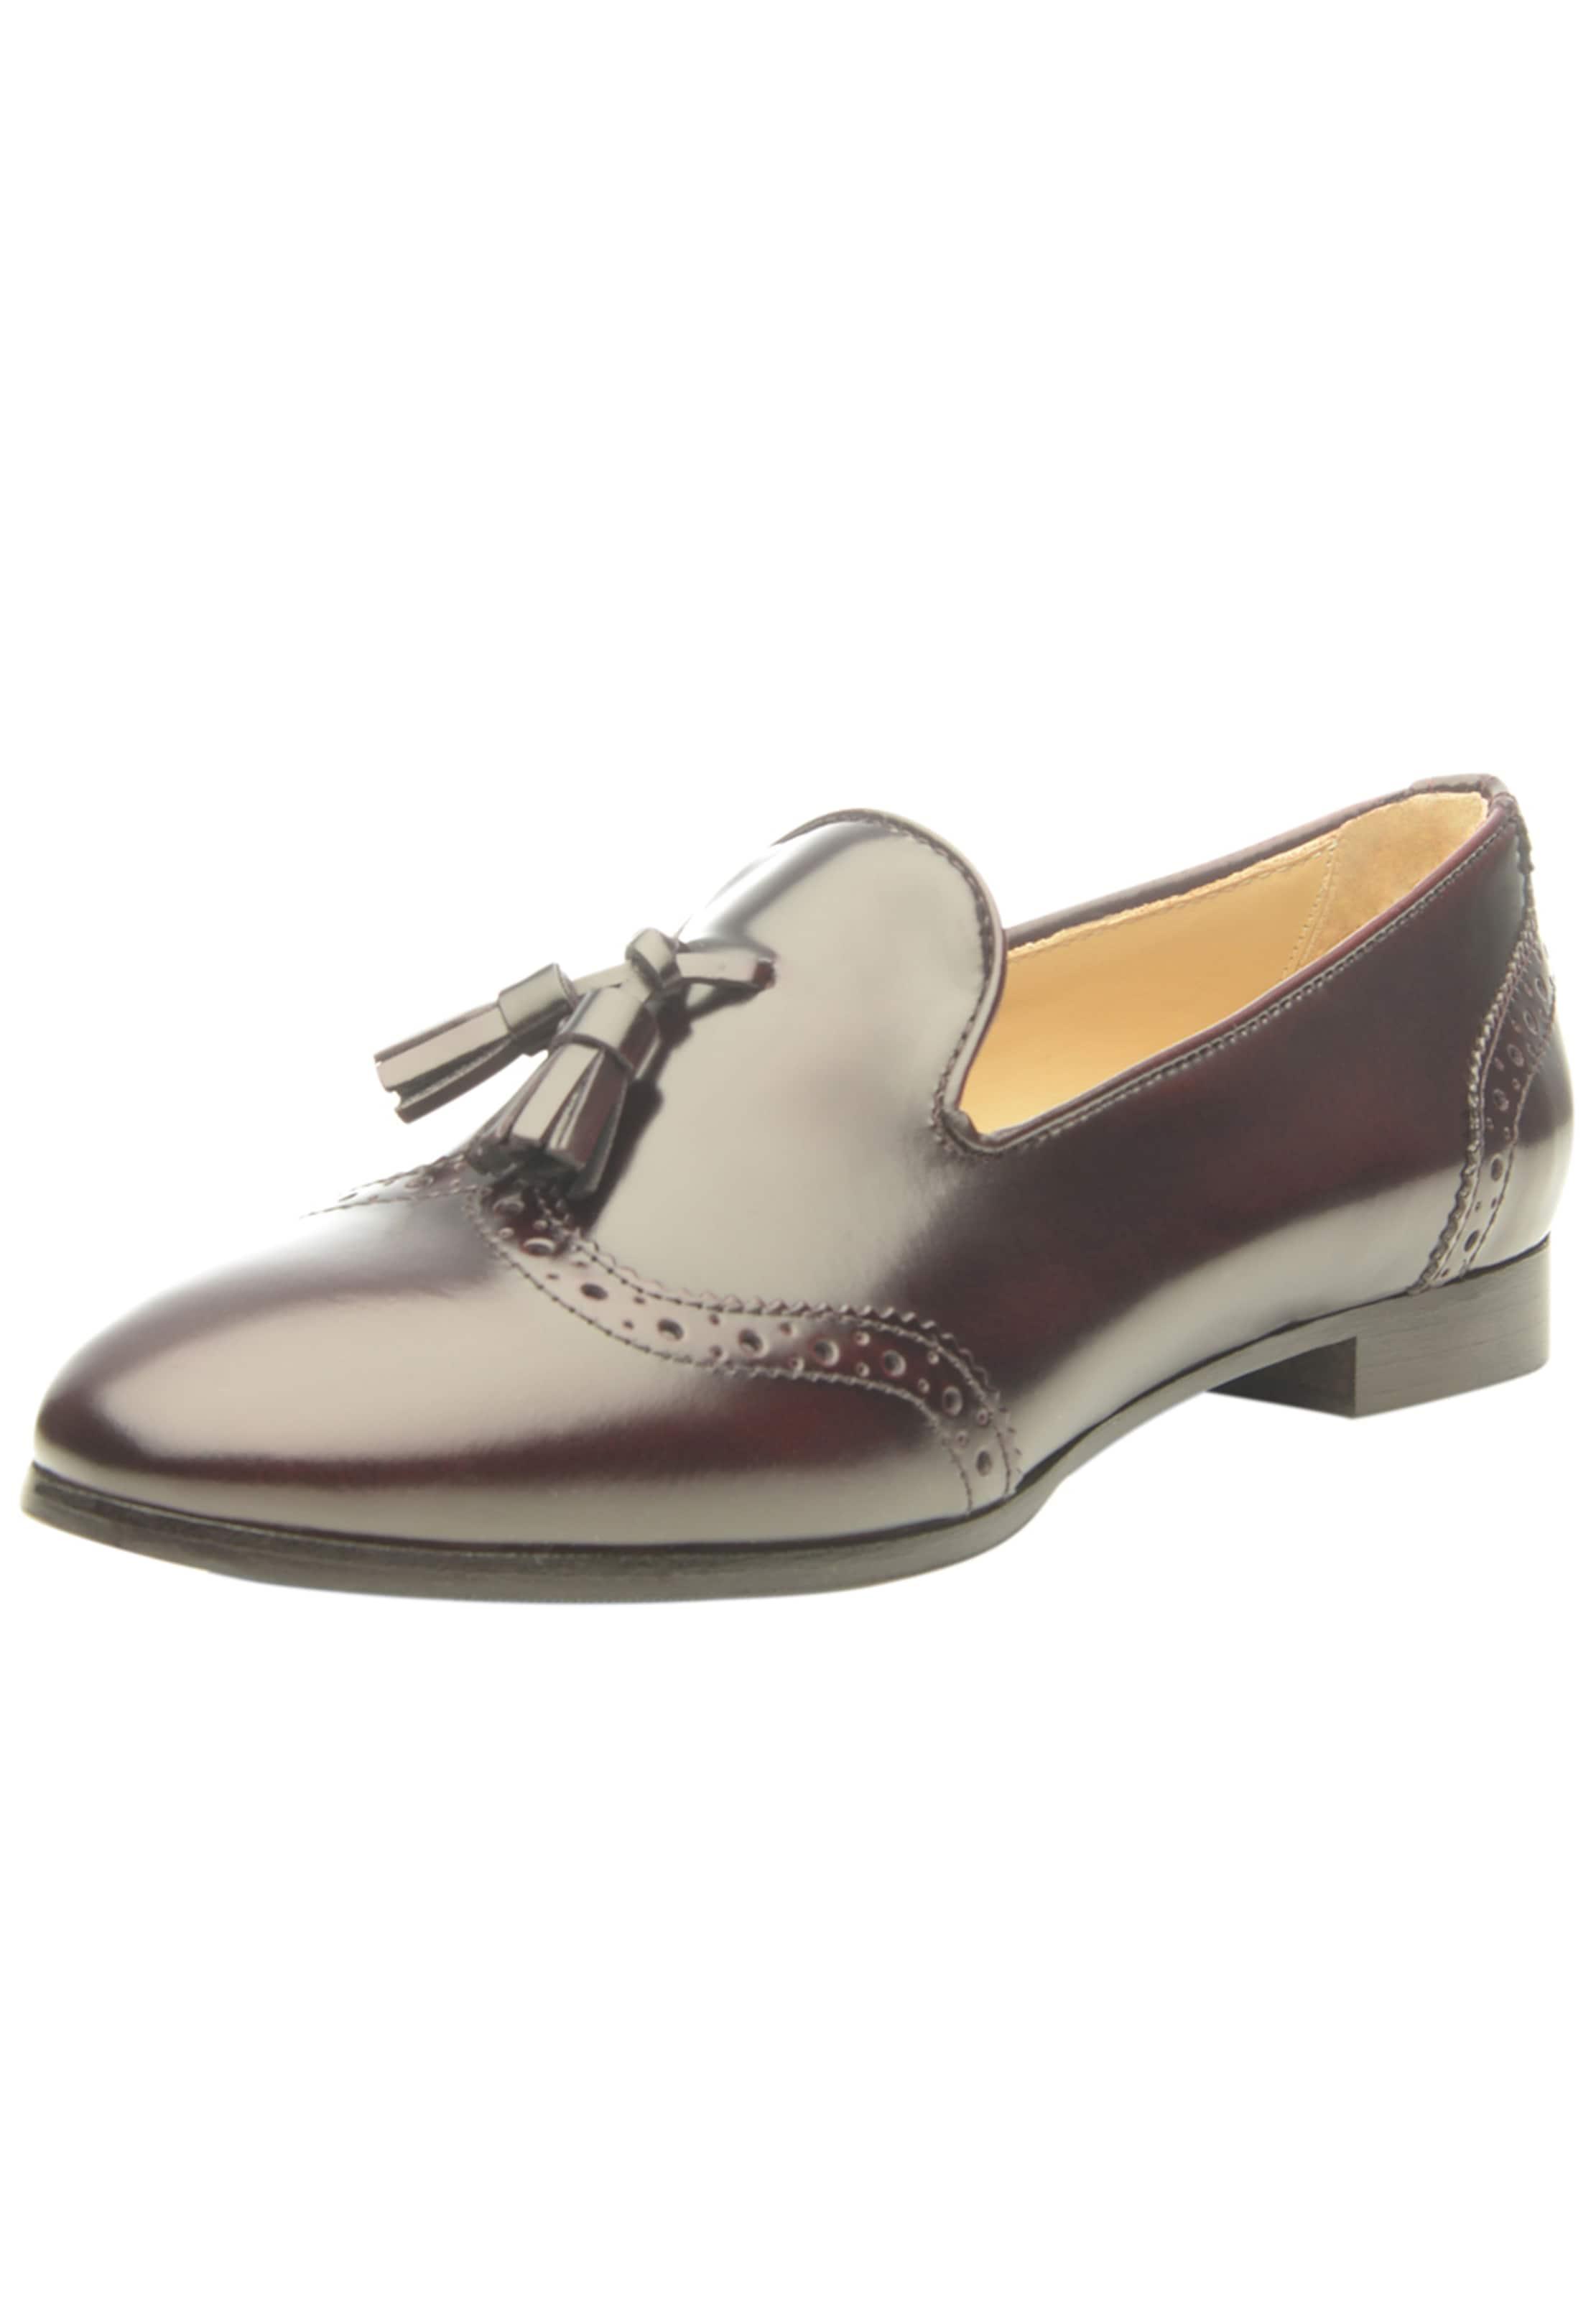 SHOEPASSION   Loafer 'No. 67 WL' Schuhe Gut getragene Schuhe